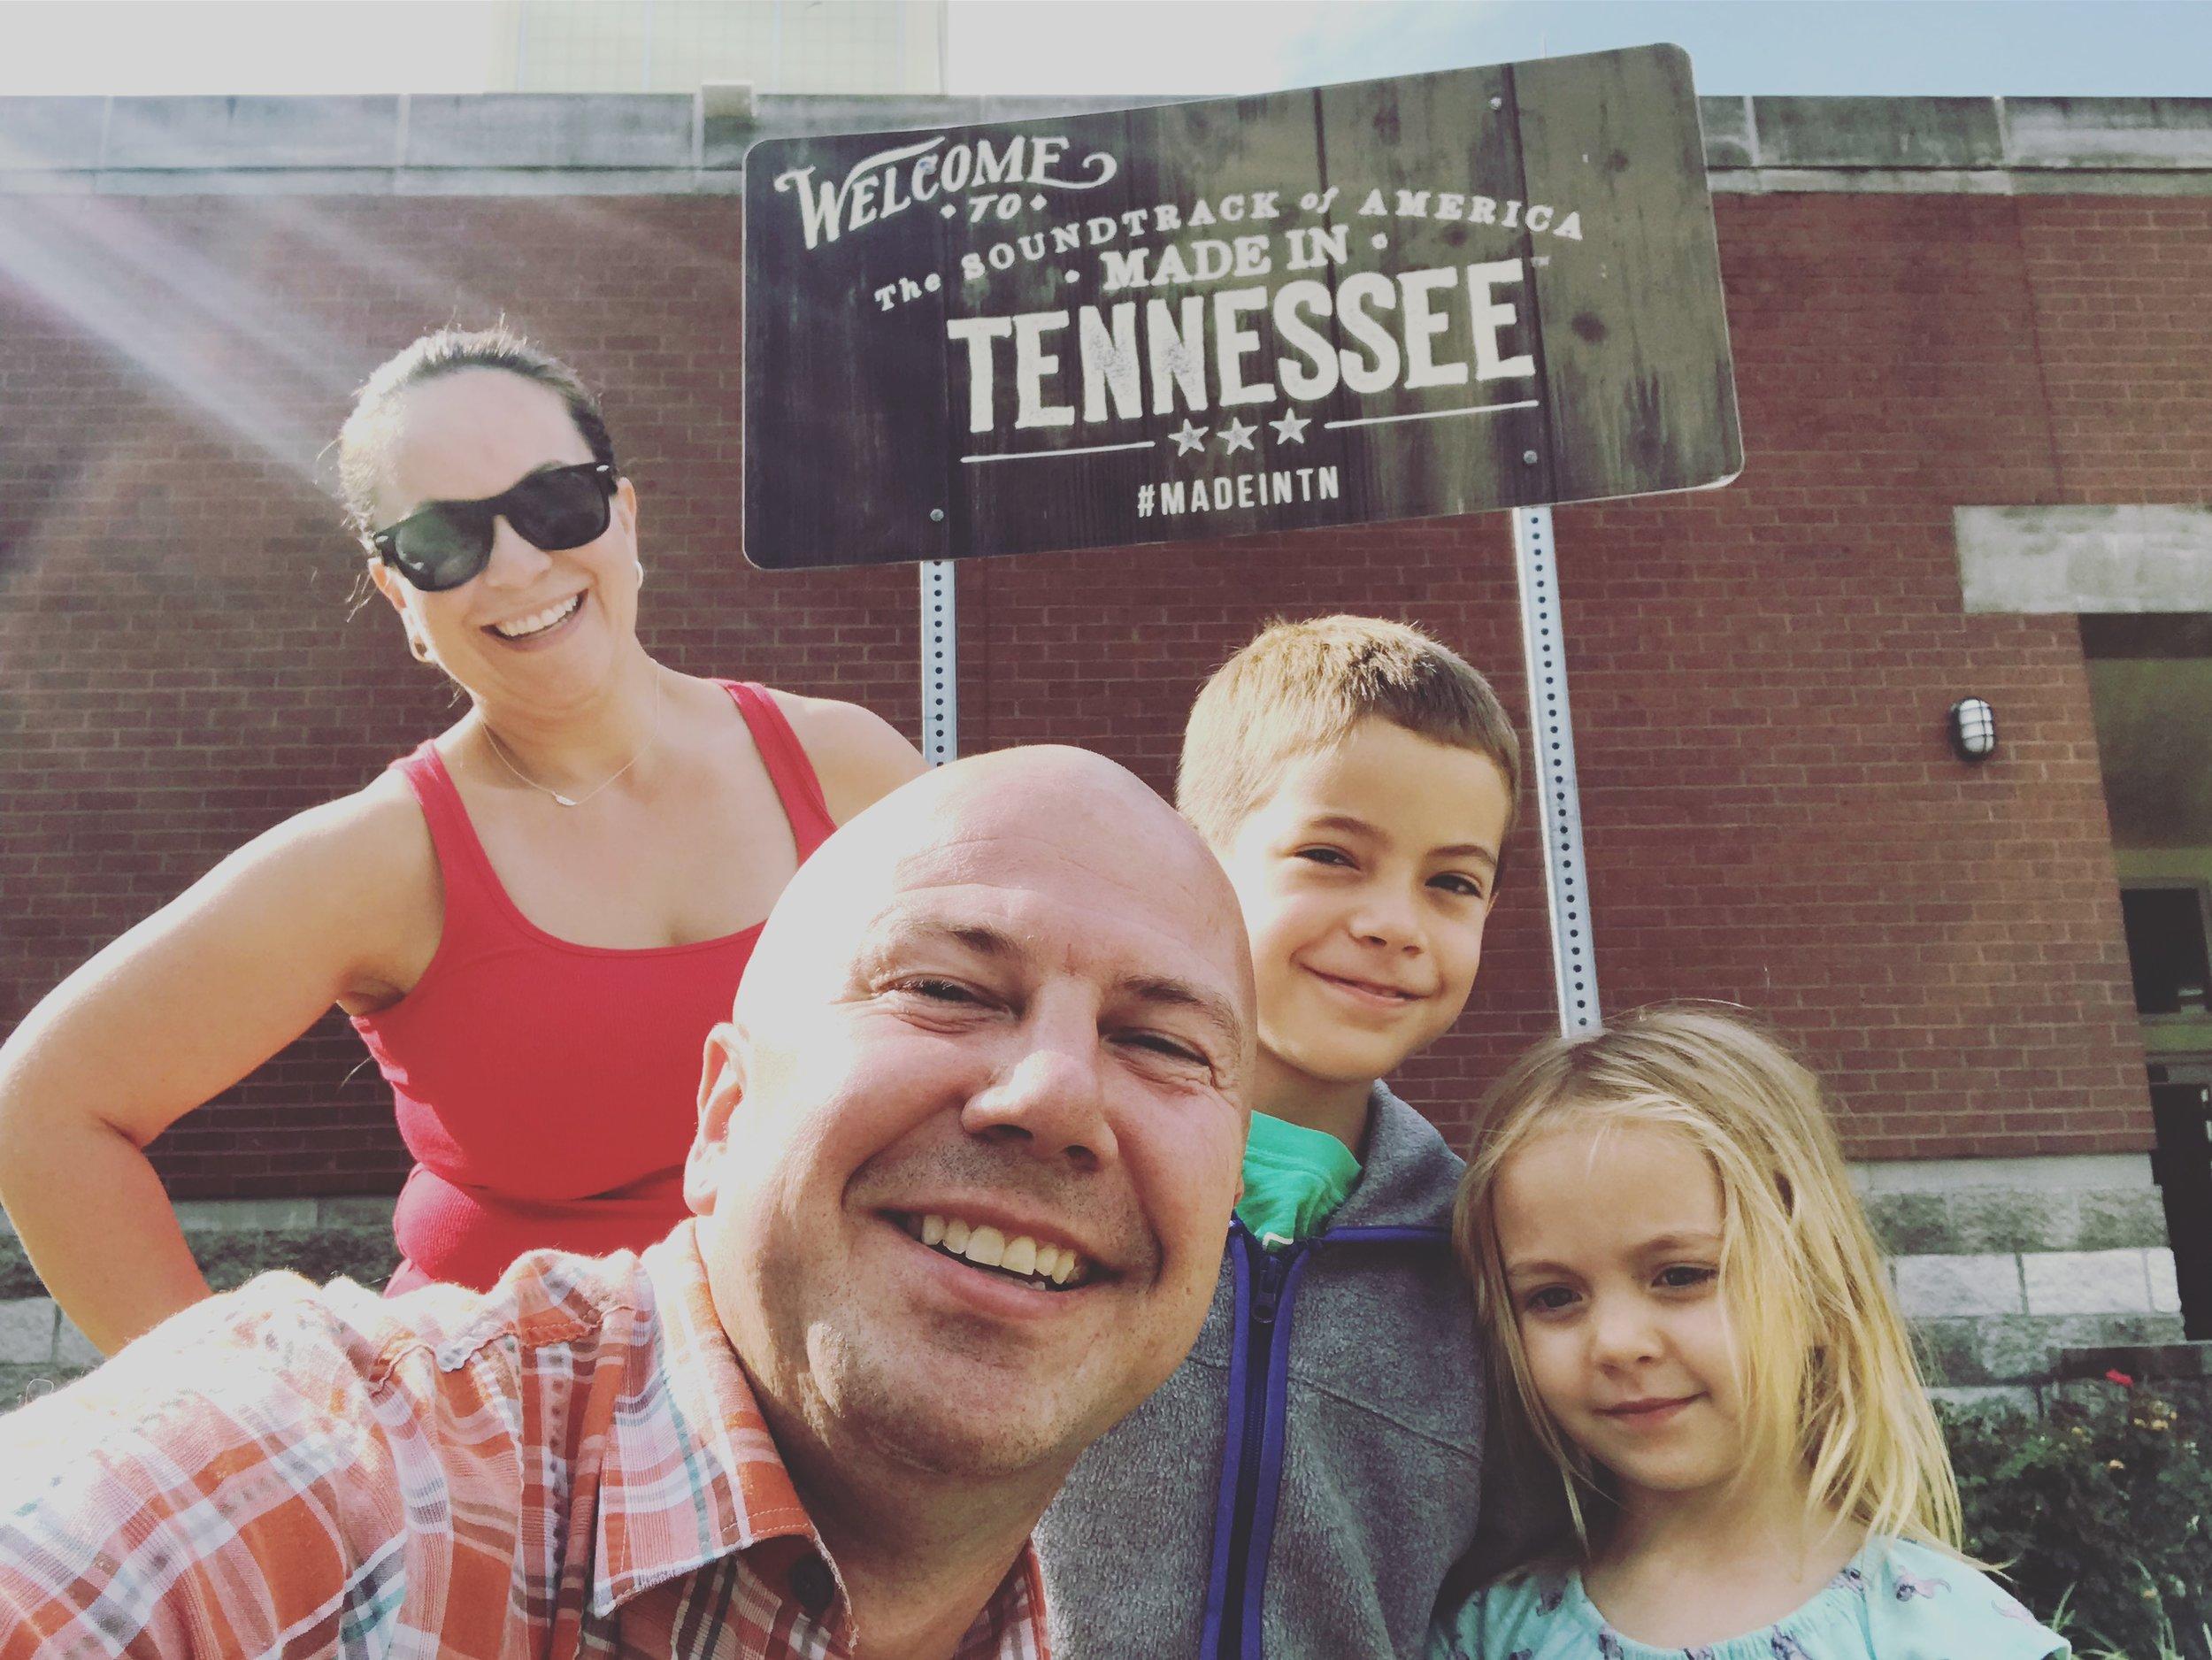 Lee-Nashville Road Trip 2018-07 Tennessee state line.jpg